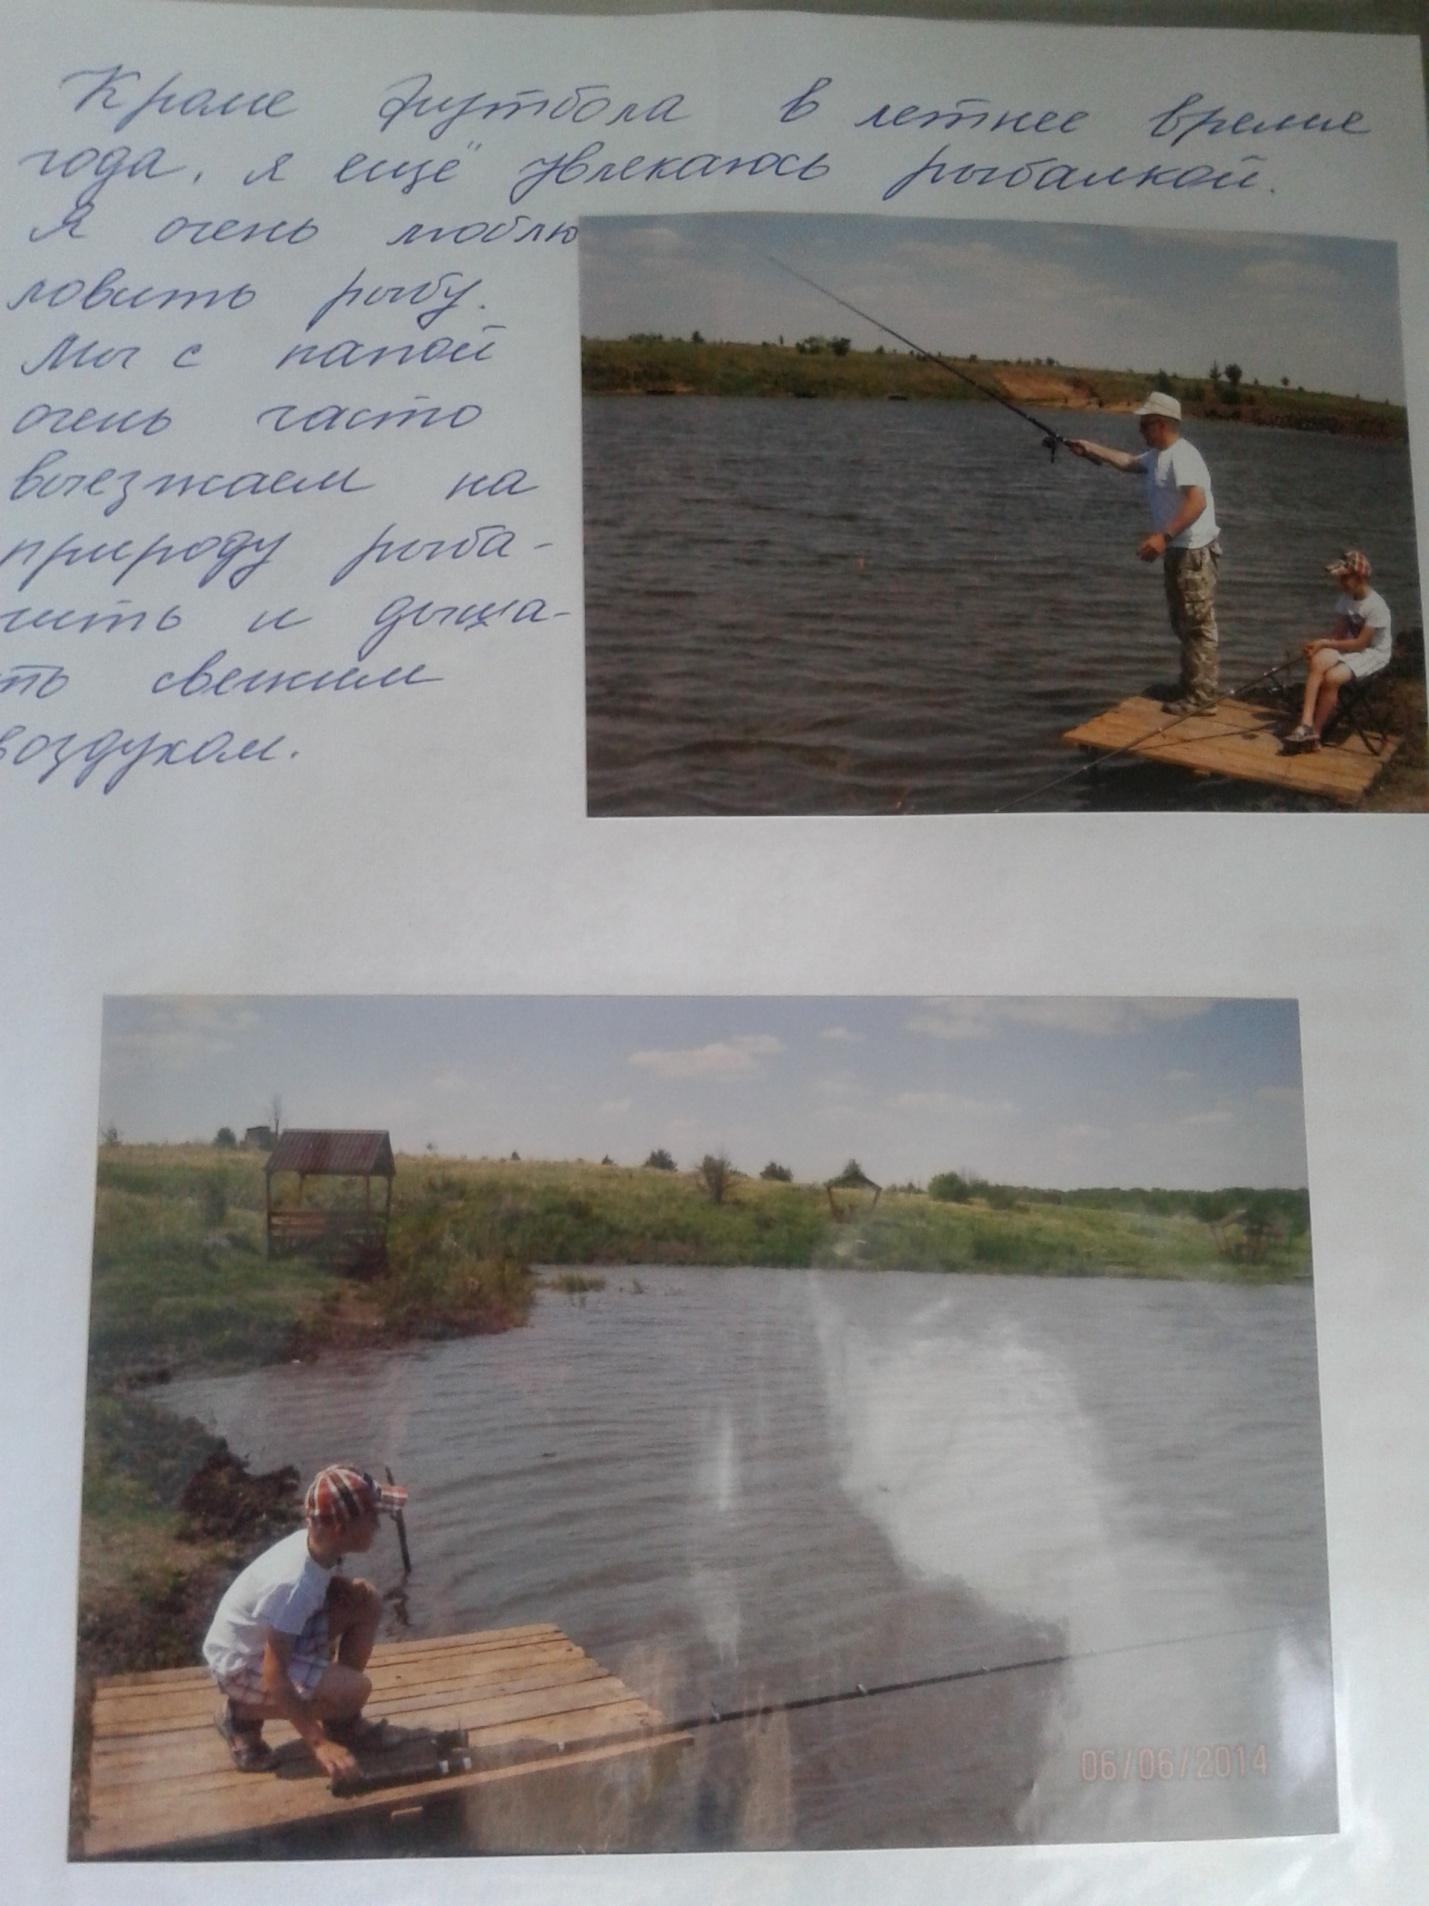 C:\Users\Vladimir\Pictures\2016-01-21 долматов портфолио\долматов портфолио 040.jpg